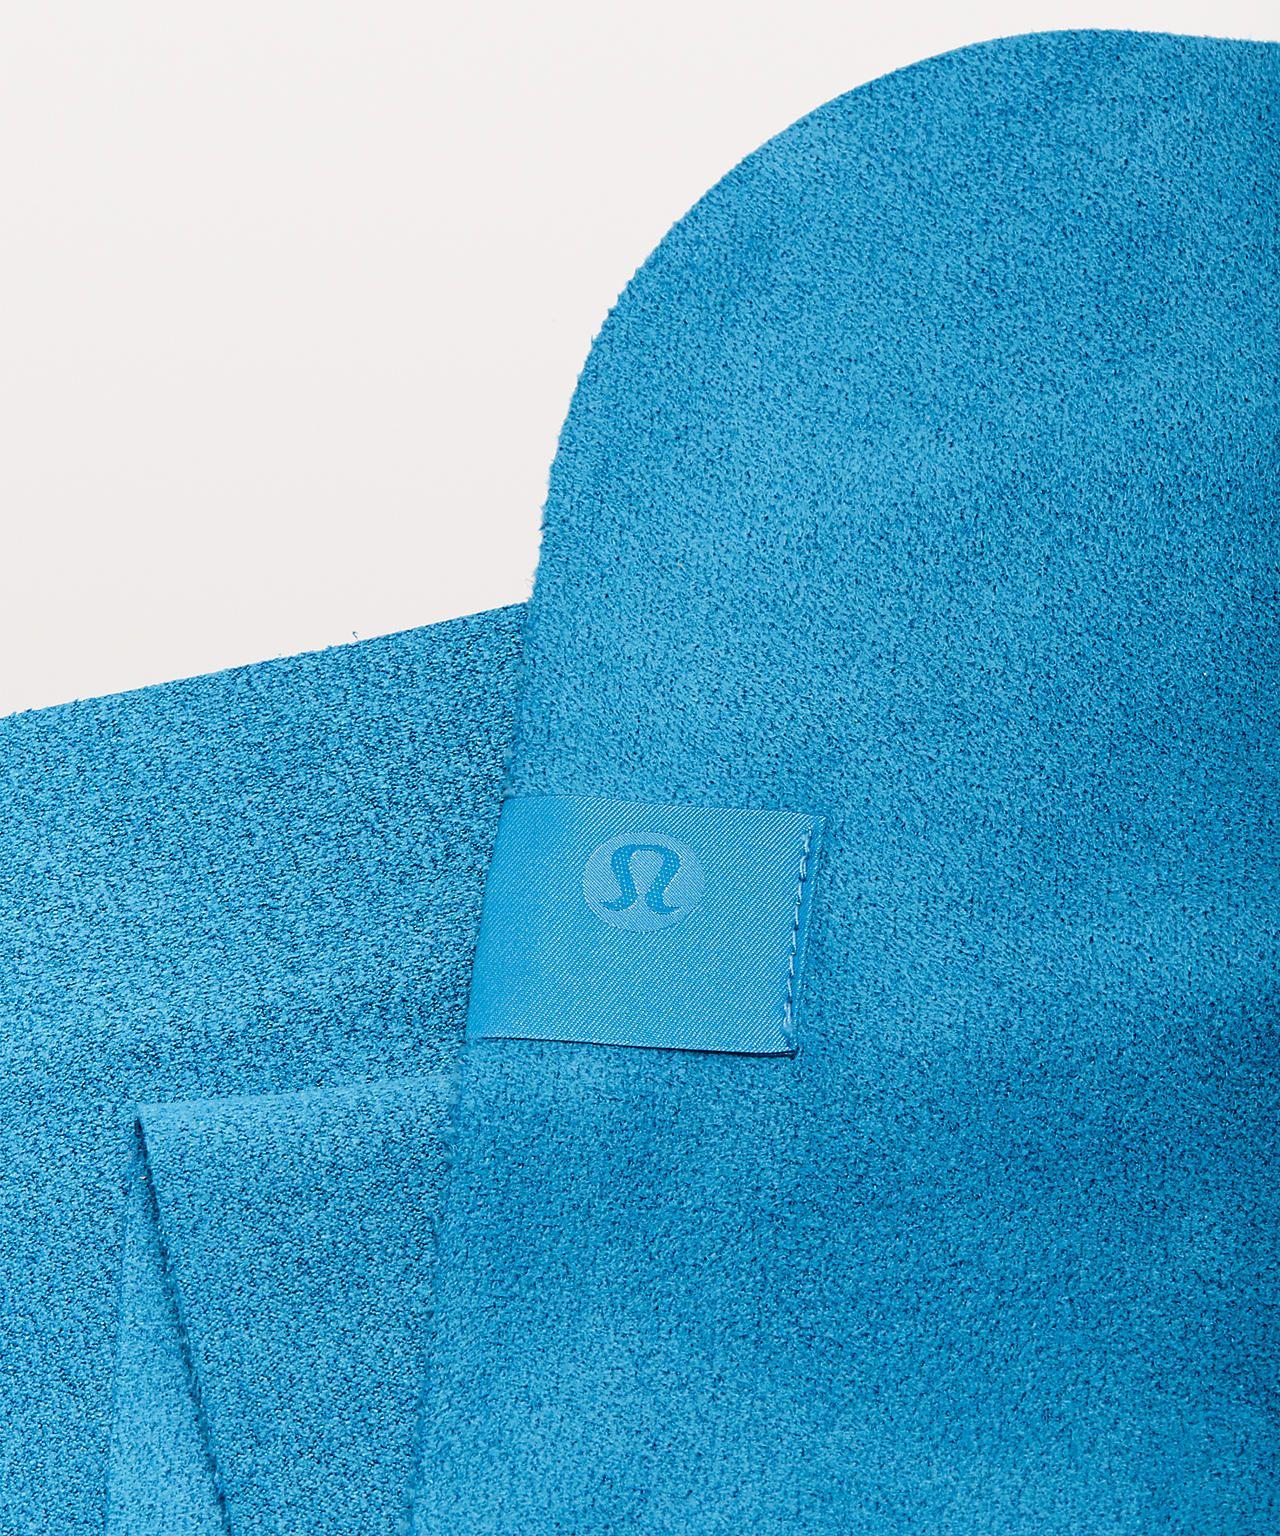 The small towel womens yoga mats lululemon small